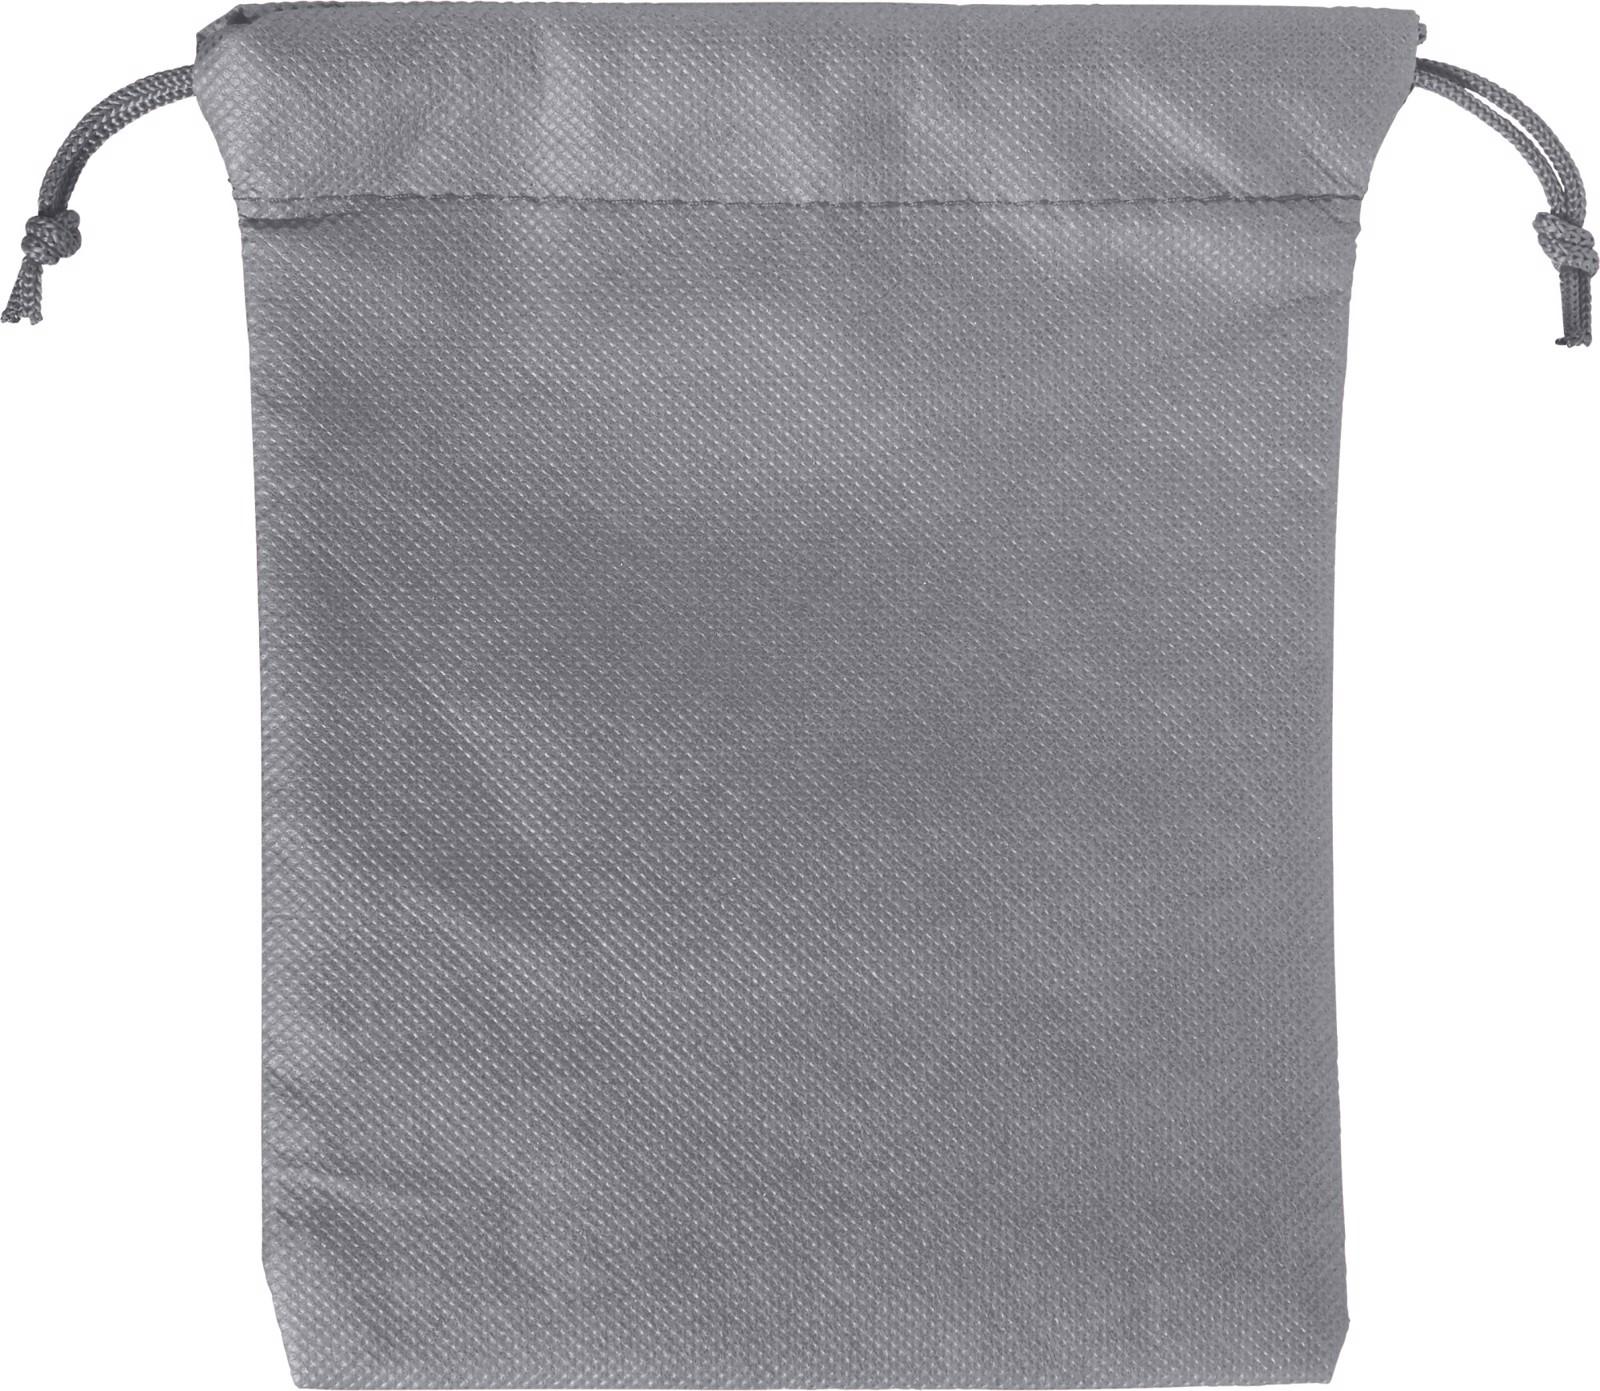 Nonwoven (80 gr/m²) drawstring pouch - Grey